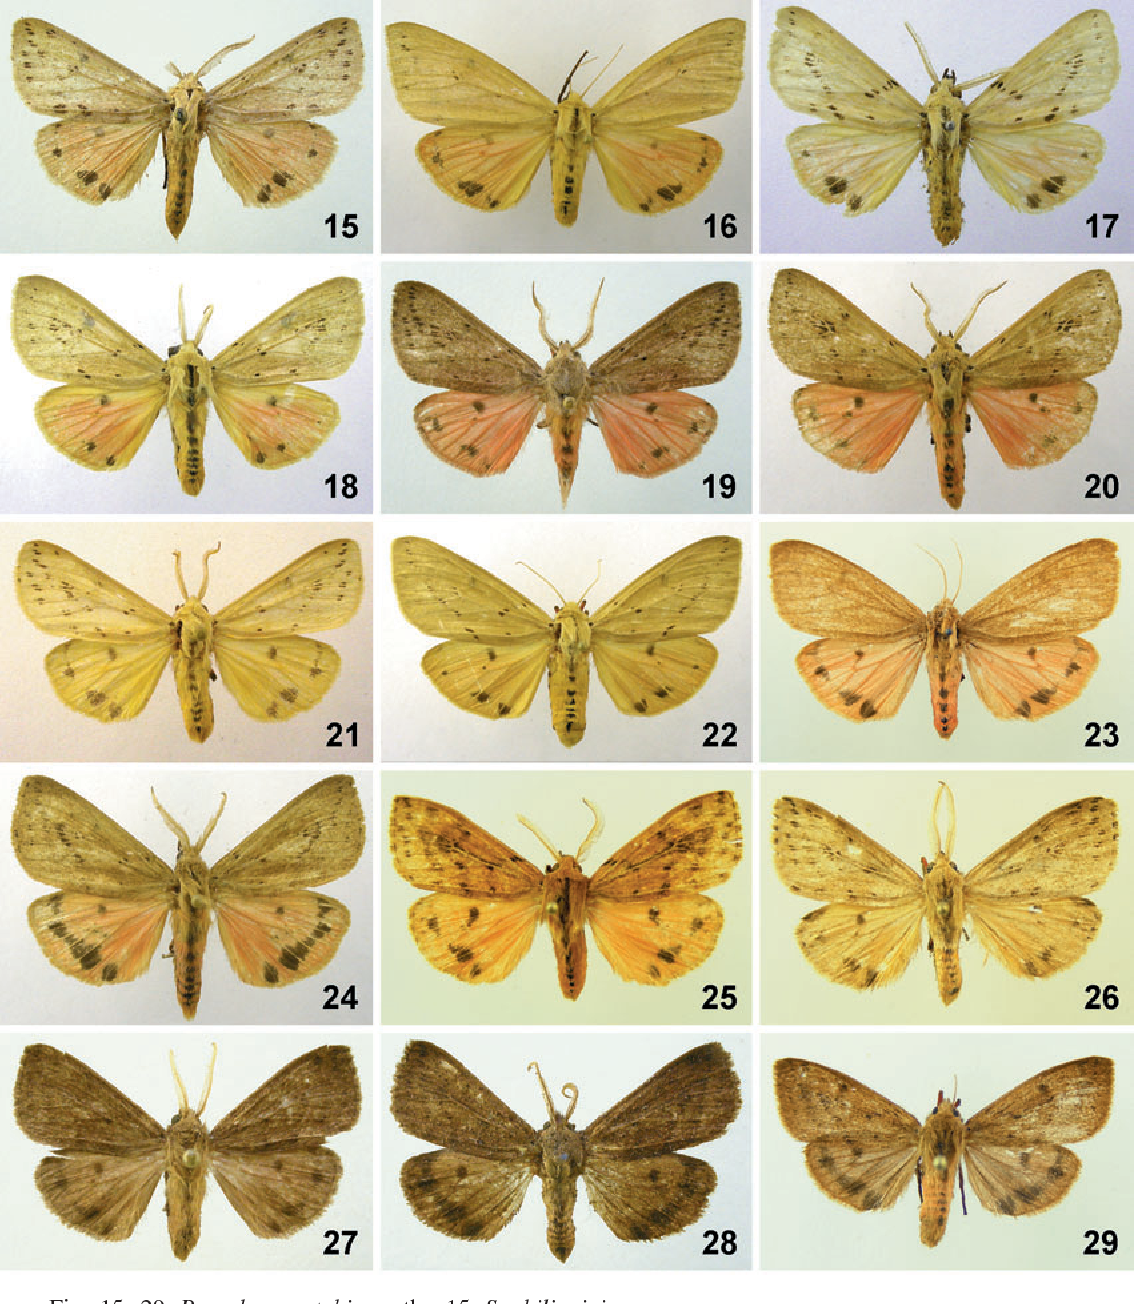 figure 15-29